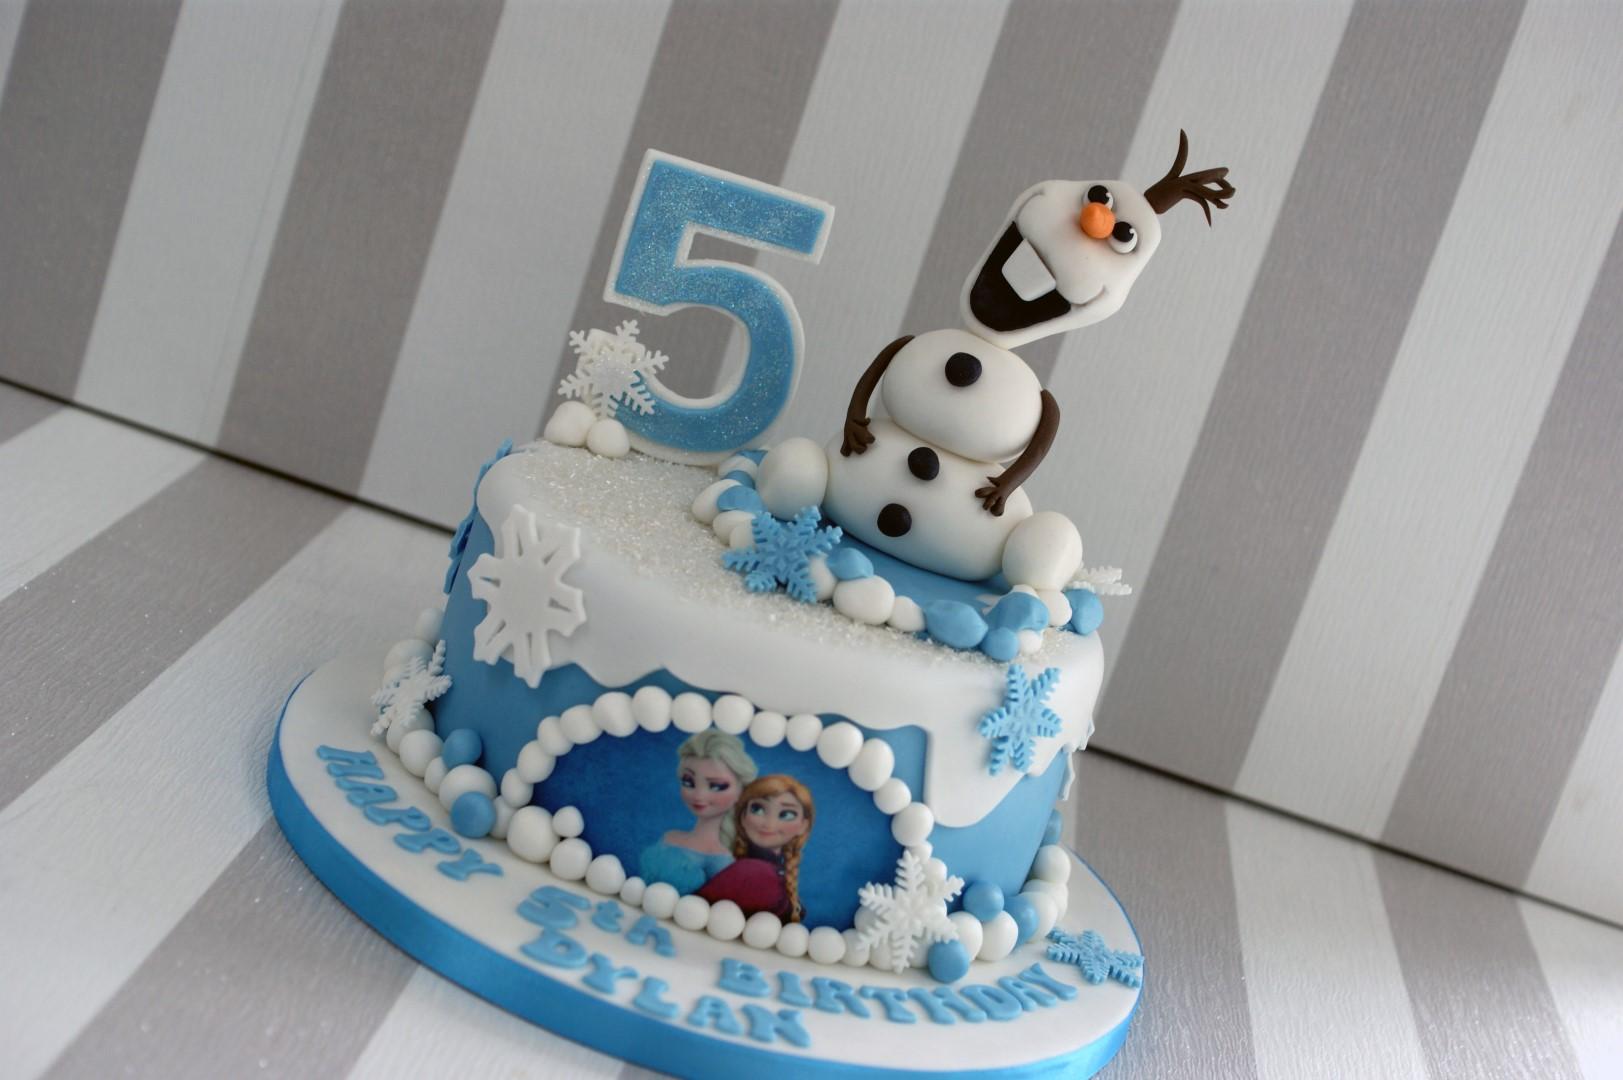 Happy Birthday You Cake